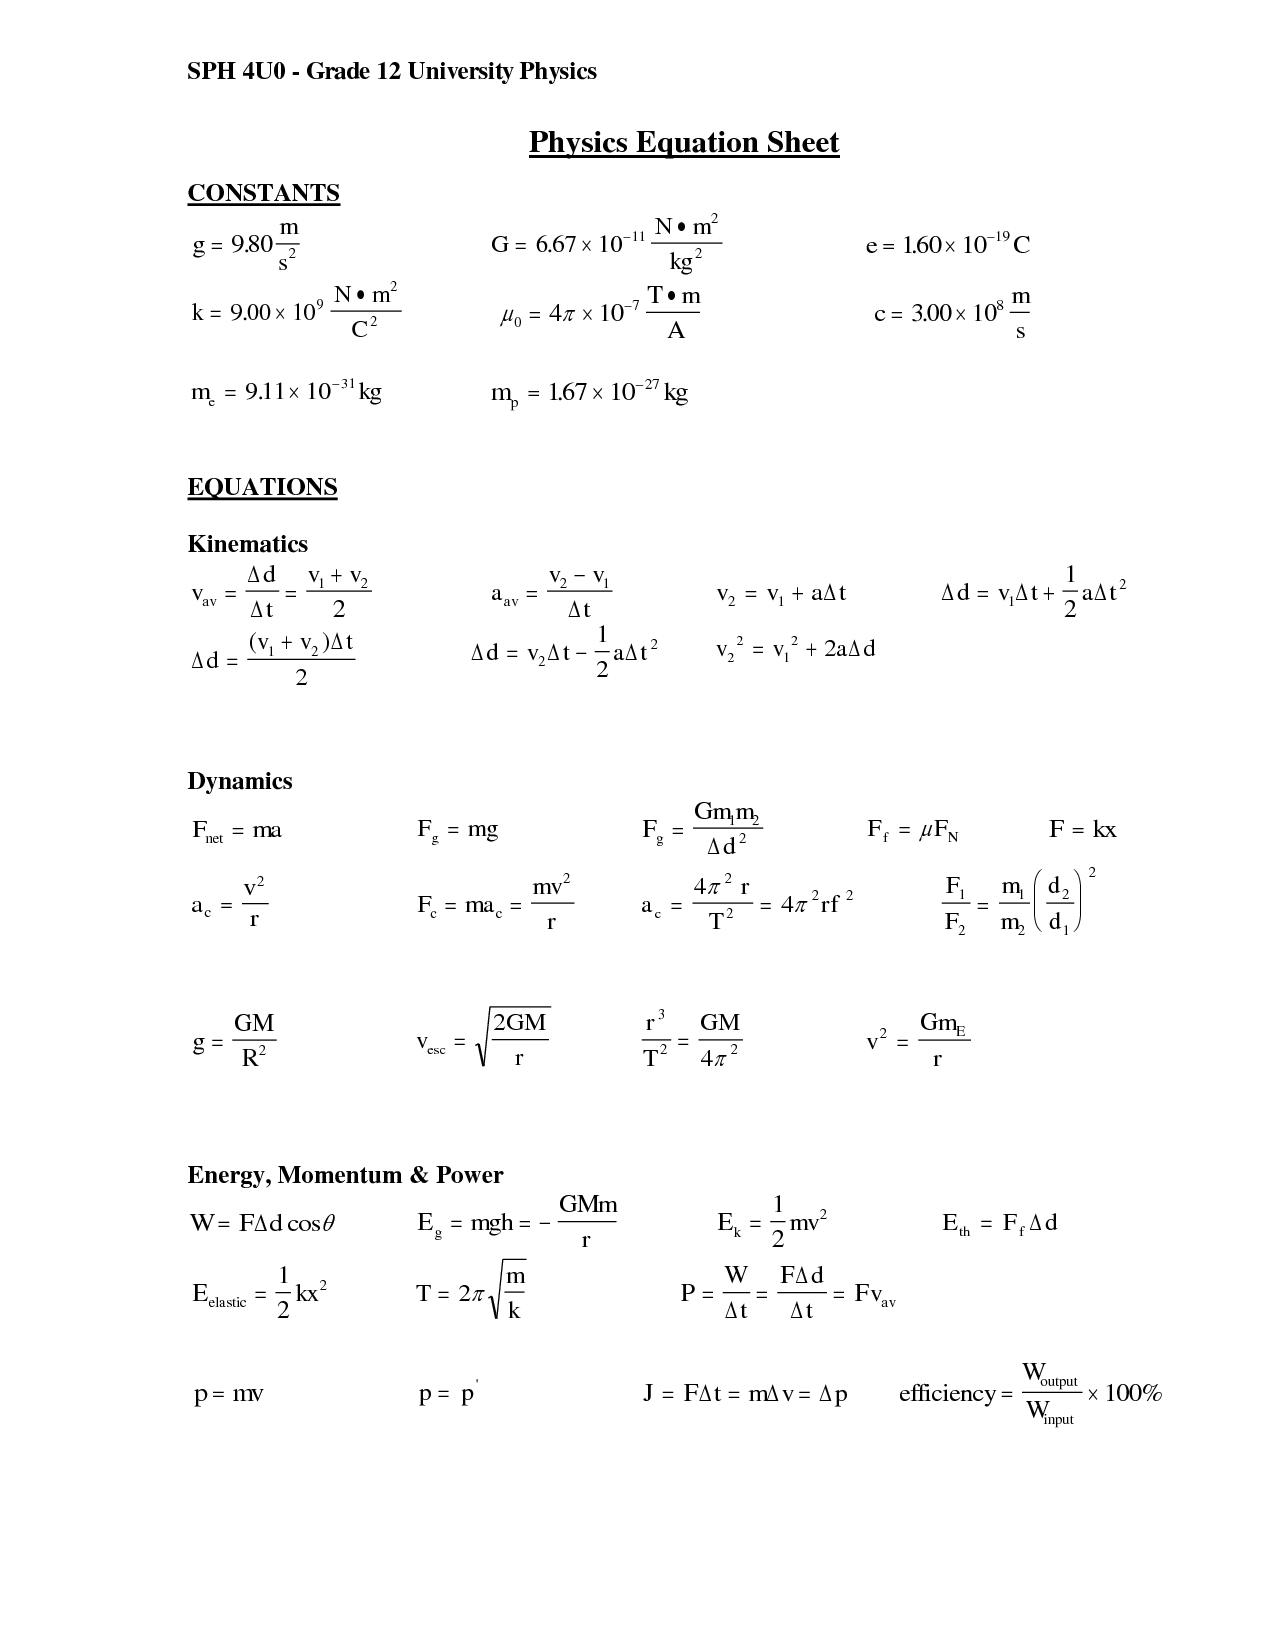 Pin By Hannah Solo On Physics Formula Sheet